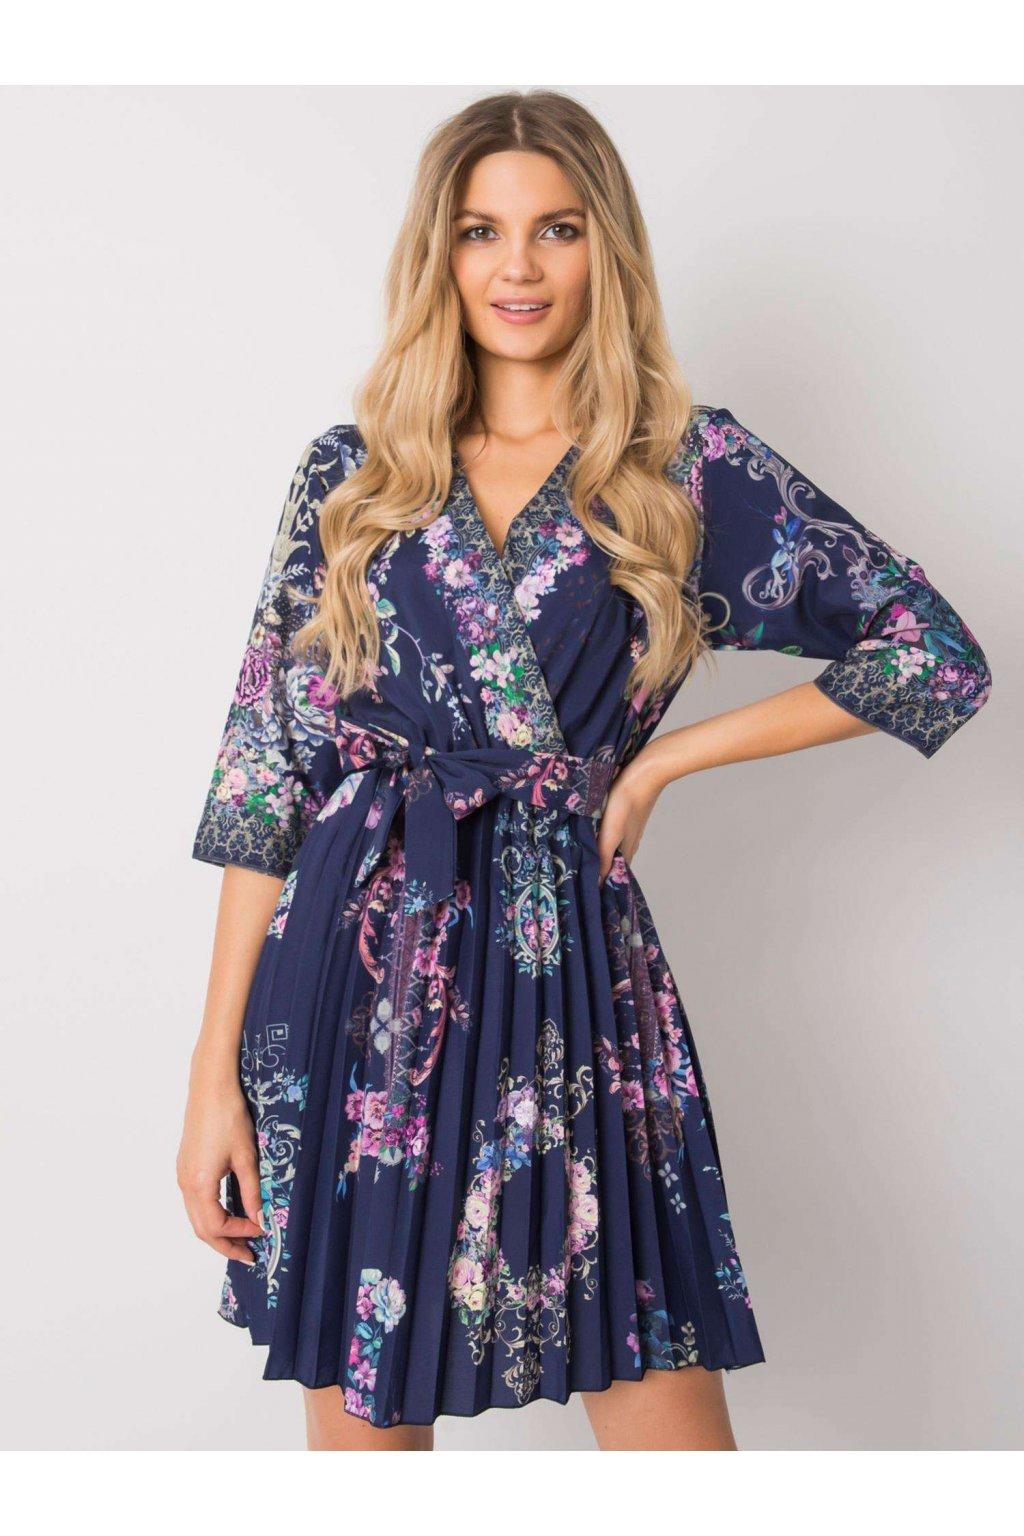 pol pl Granatowa sukienka plisowana Xana 374889 1